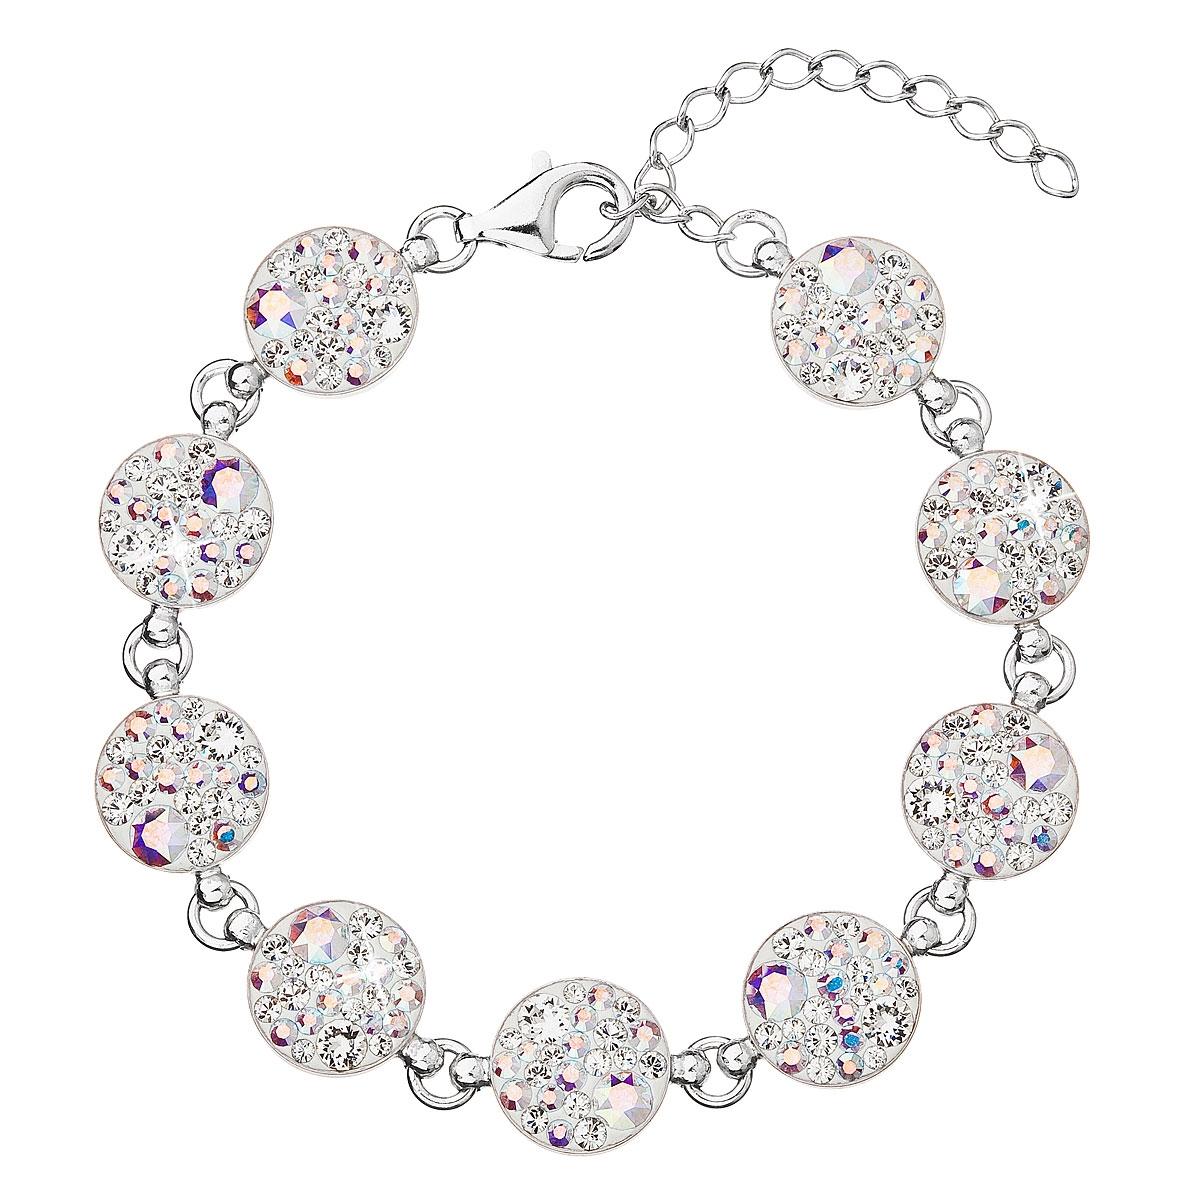 Stříbrný náramek s krystaly Crystals from Swarovski® AB EG7004-AB